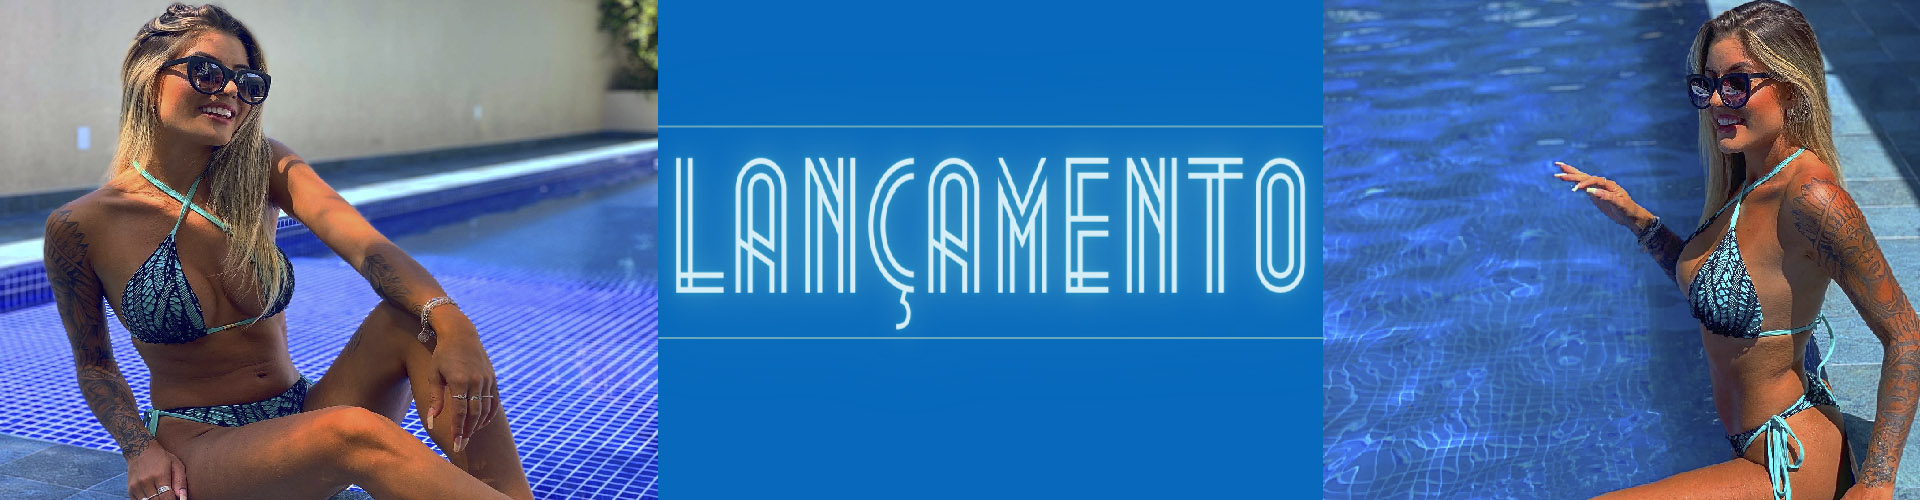 Banner Principal Blue Lançamento